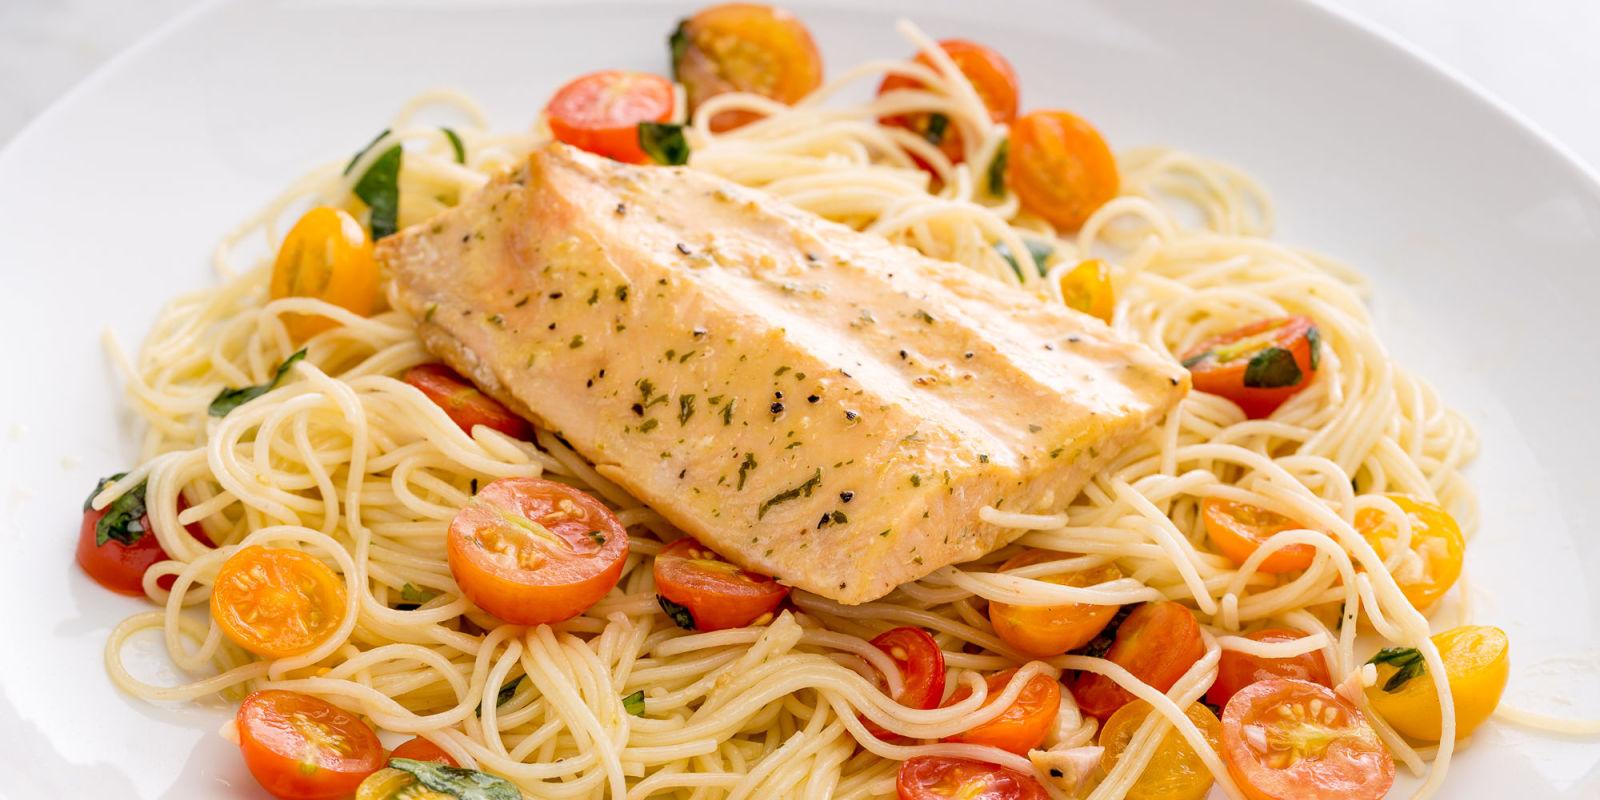 Fish fry recipes fish recipes for lent for Fish fry recipe